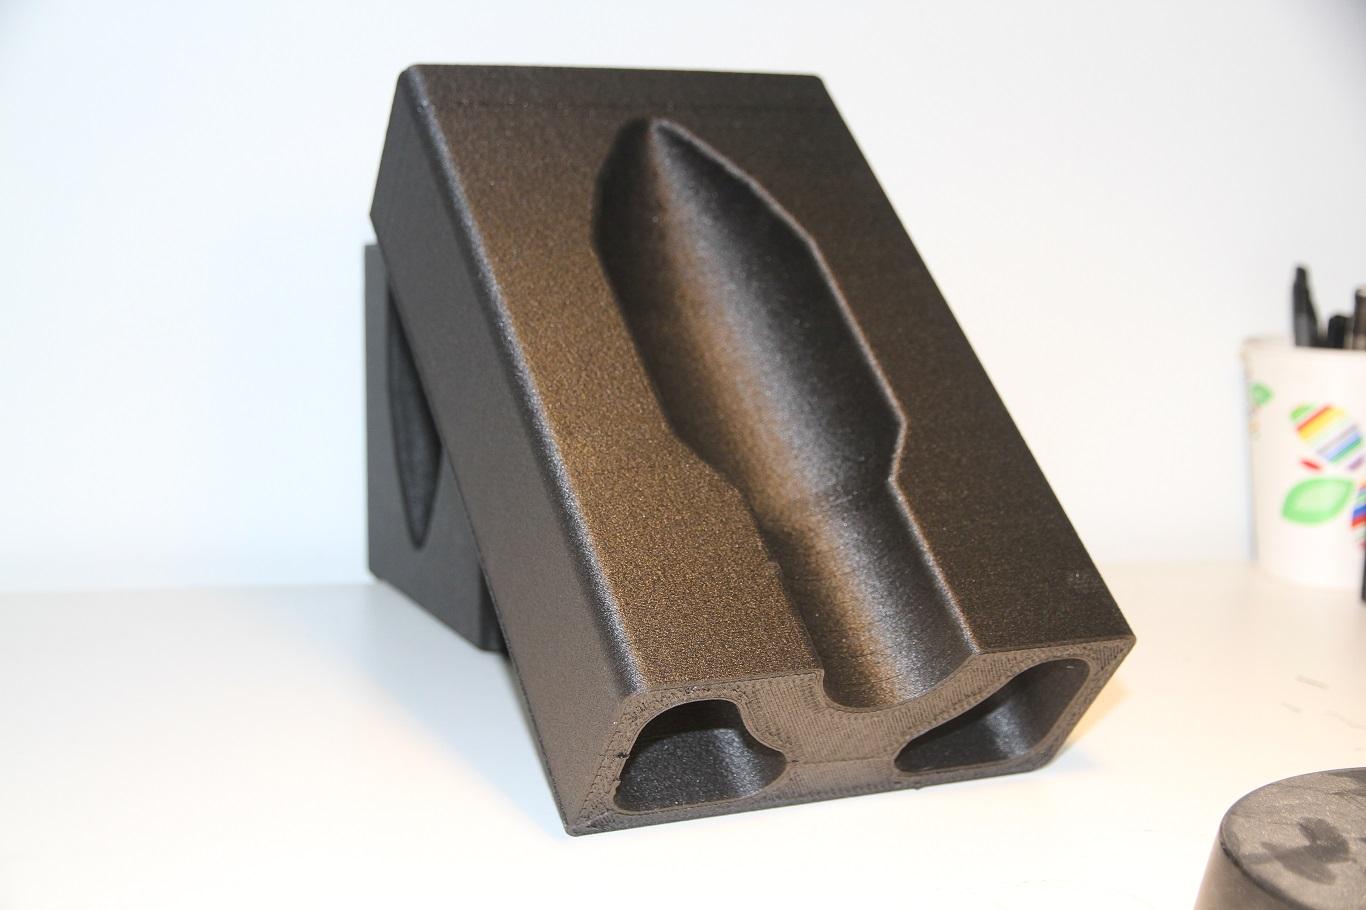 Rocket Nozzle Layup Mold $450